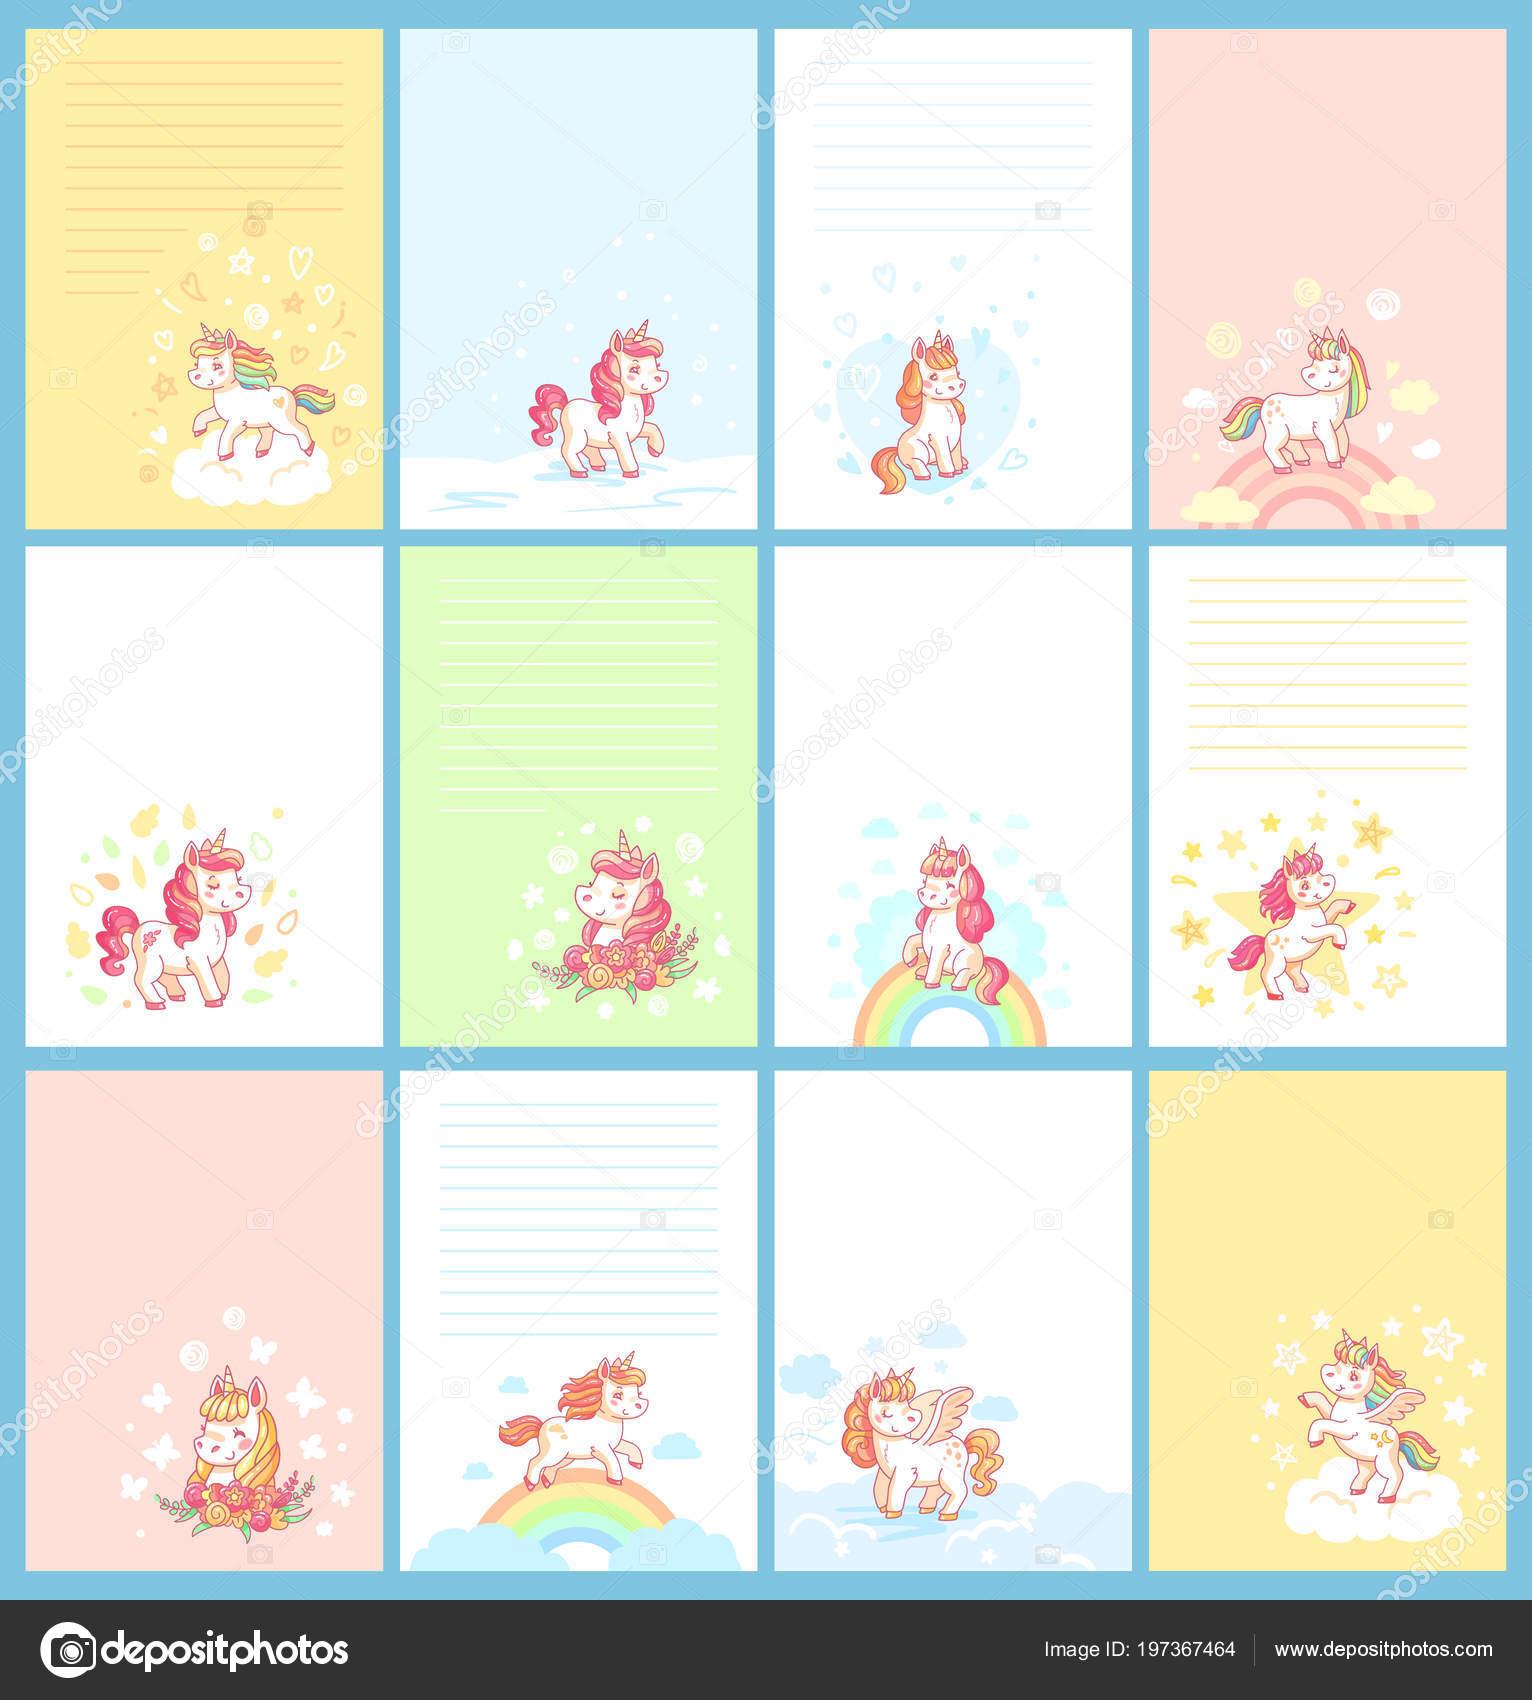 Unicornio lindo mágico dibujos animados una plantilla para ...